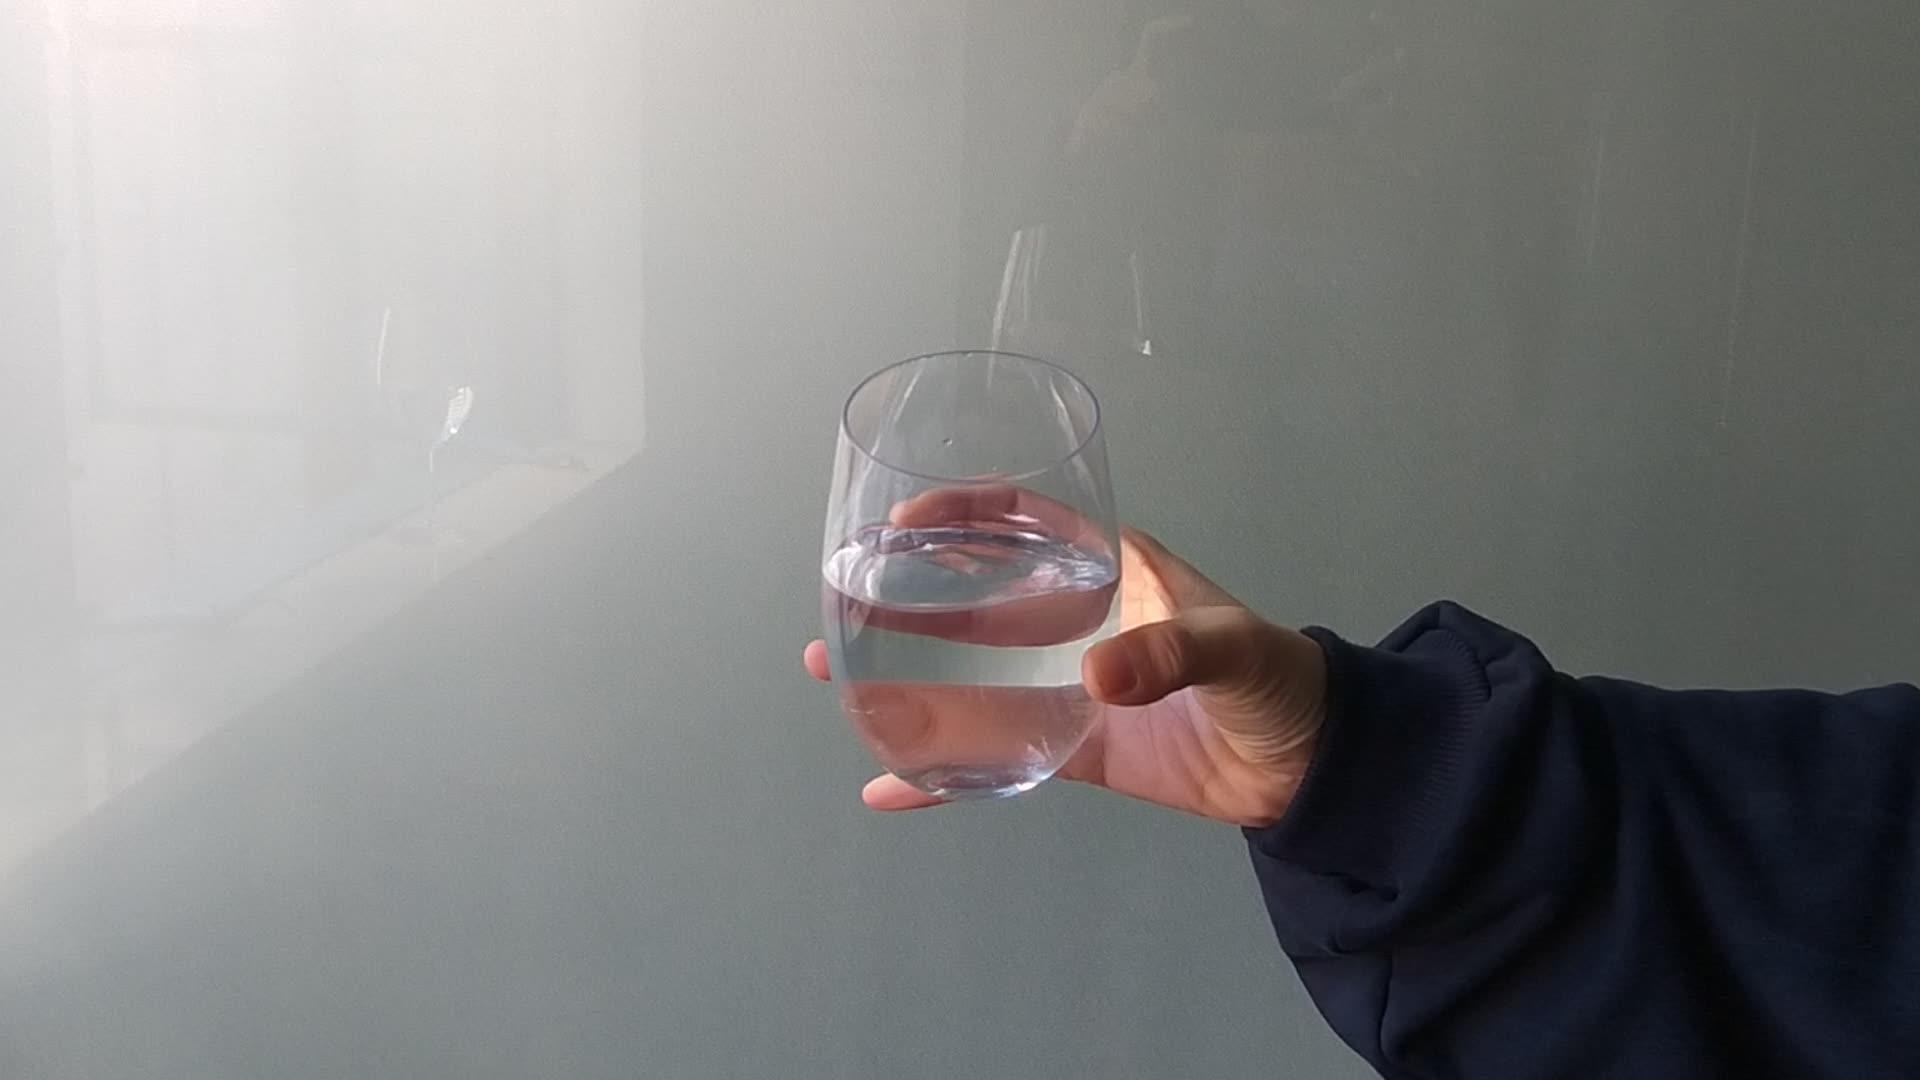 Grosir Tritan Kaca Kristal Bisa Dipecahkan Pribadi Wiski Kacamata Gelas Wiski Kaca